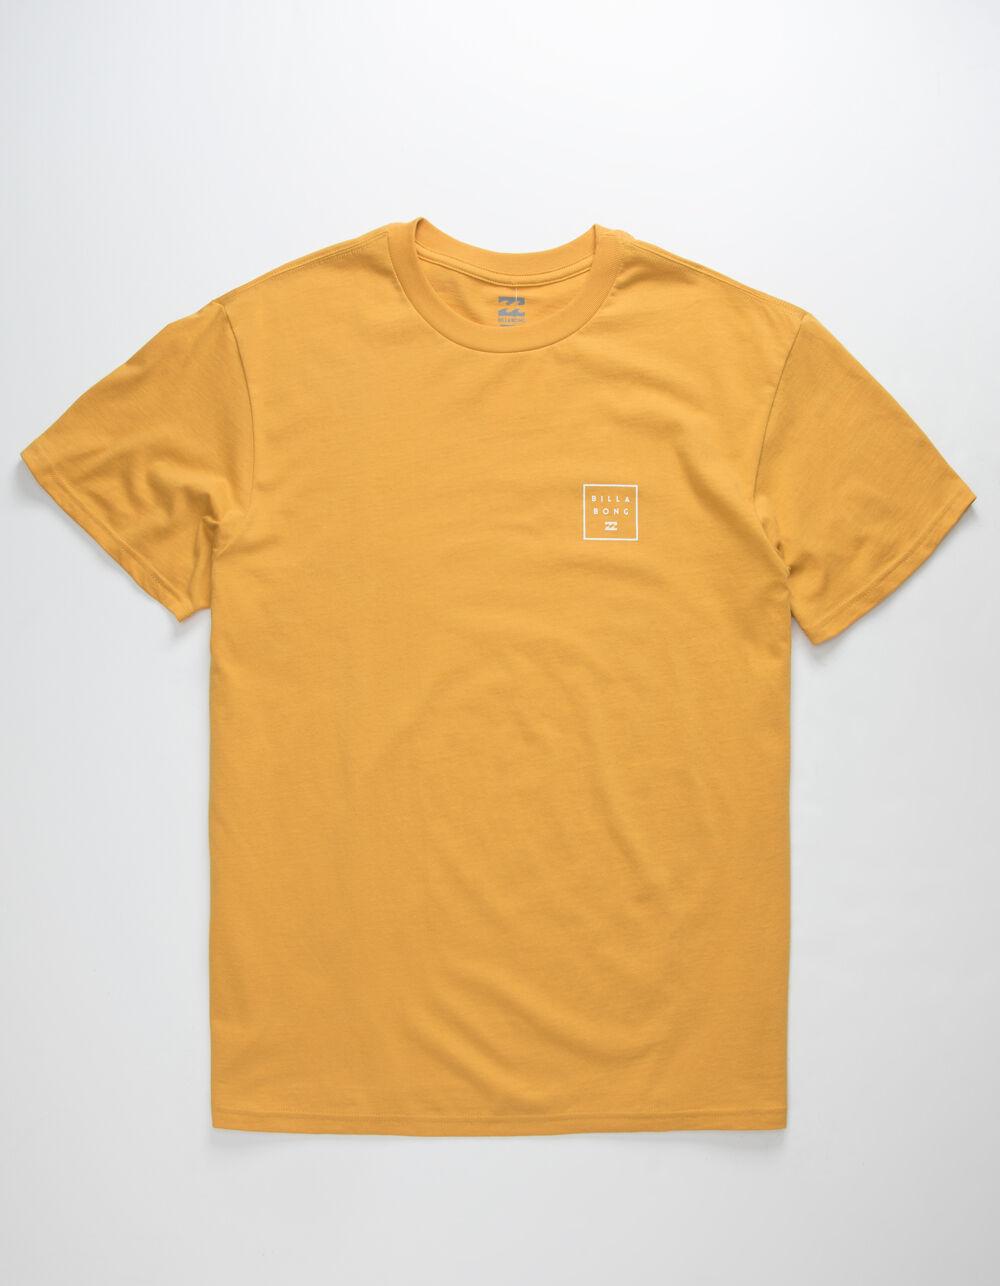 BILLABONG Stacked Gold T-Shirt